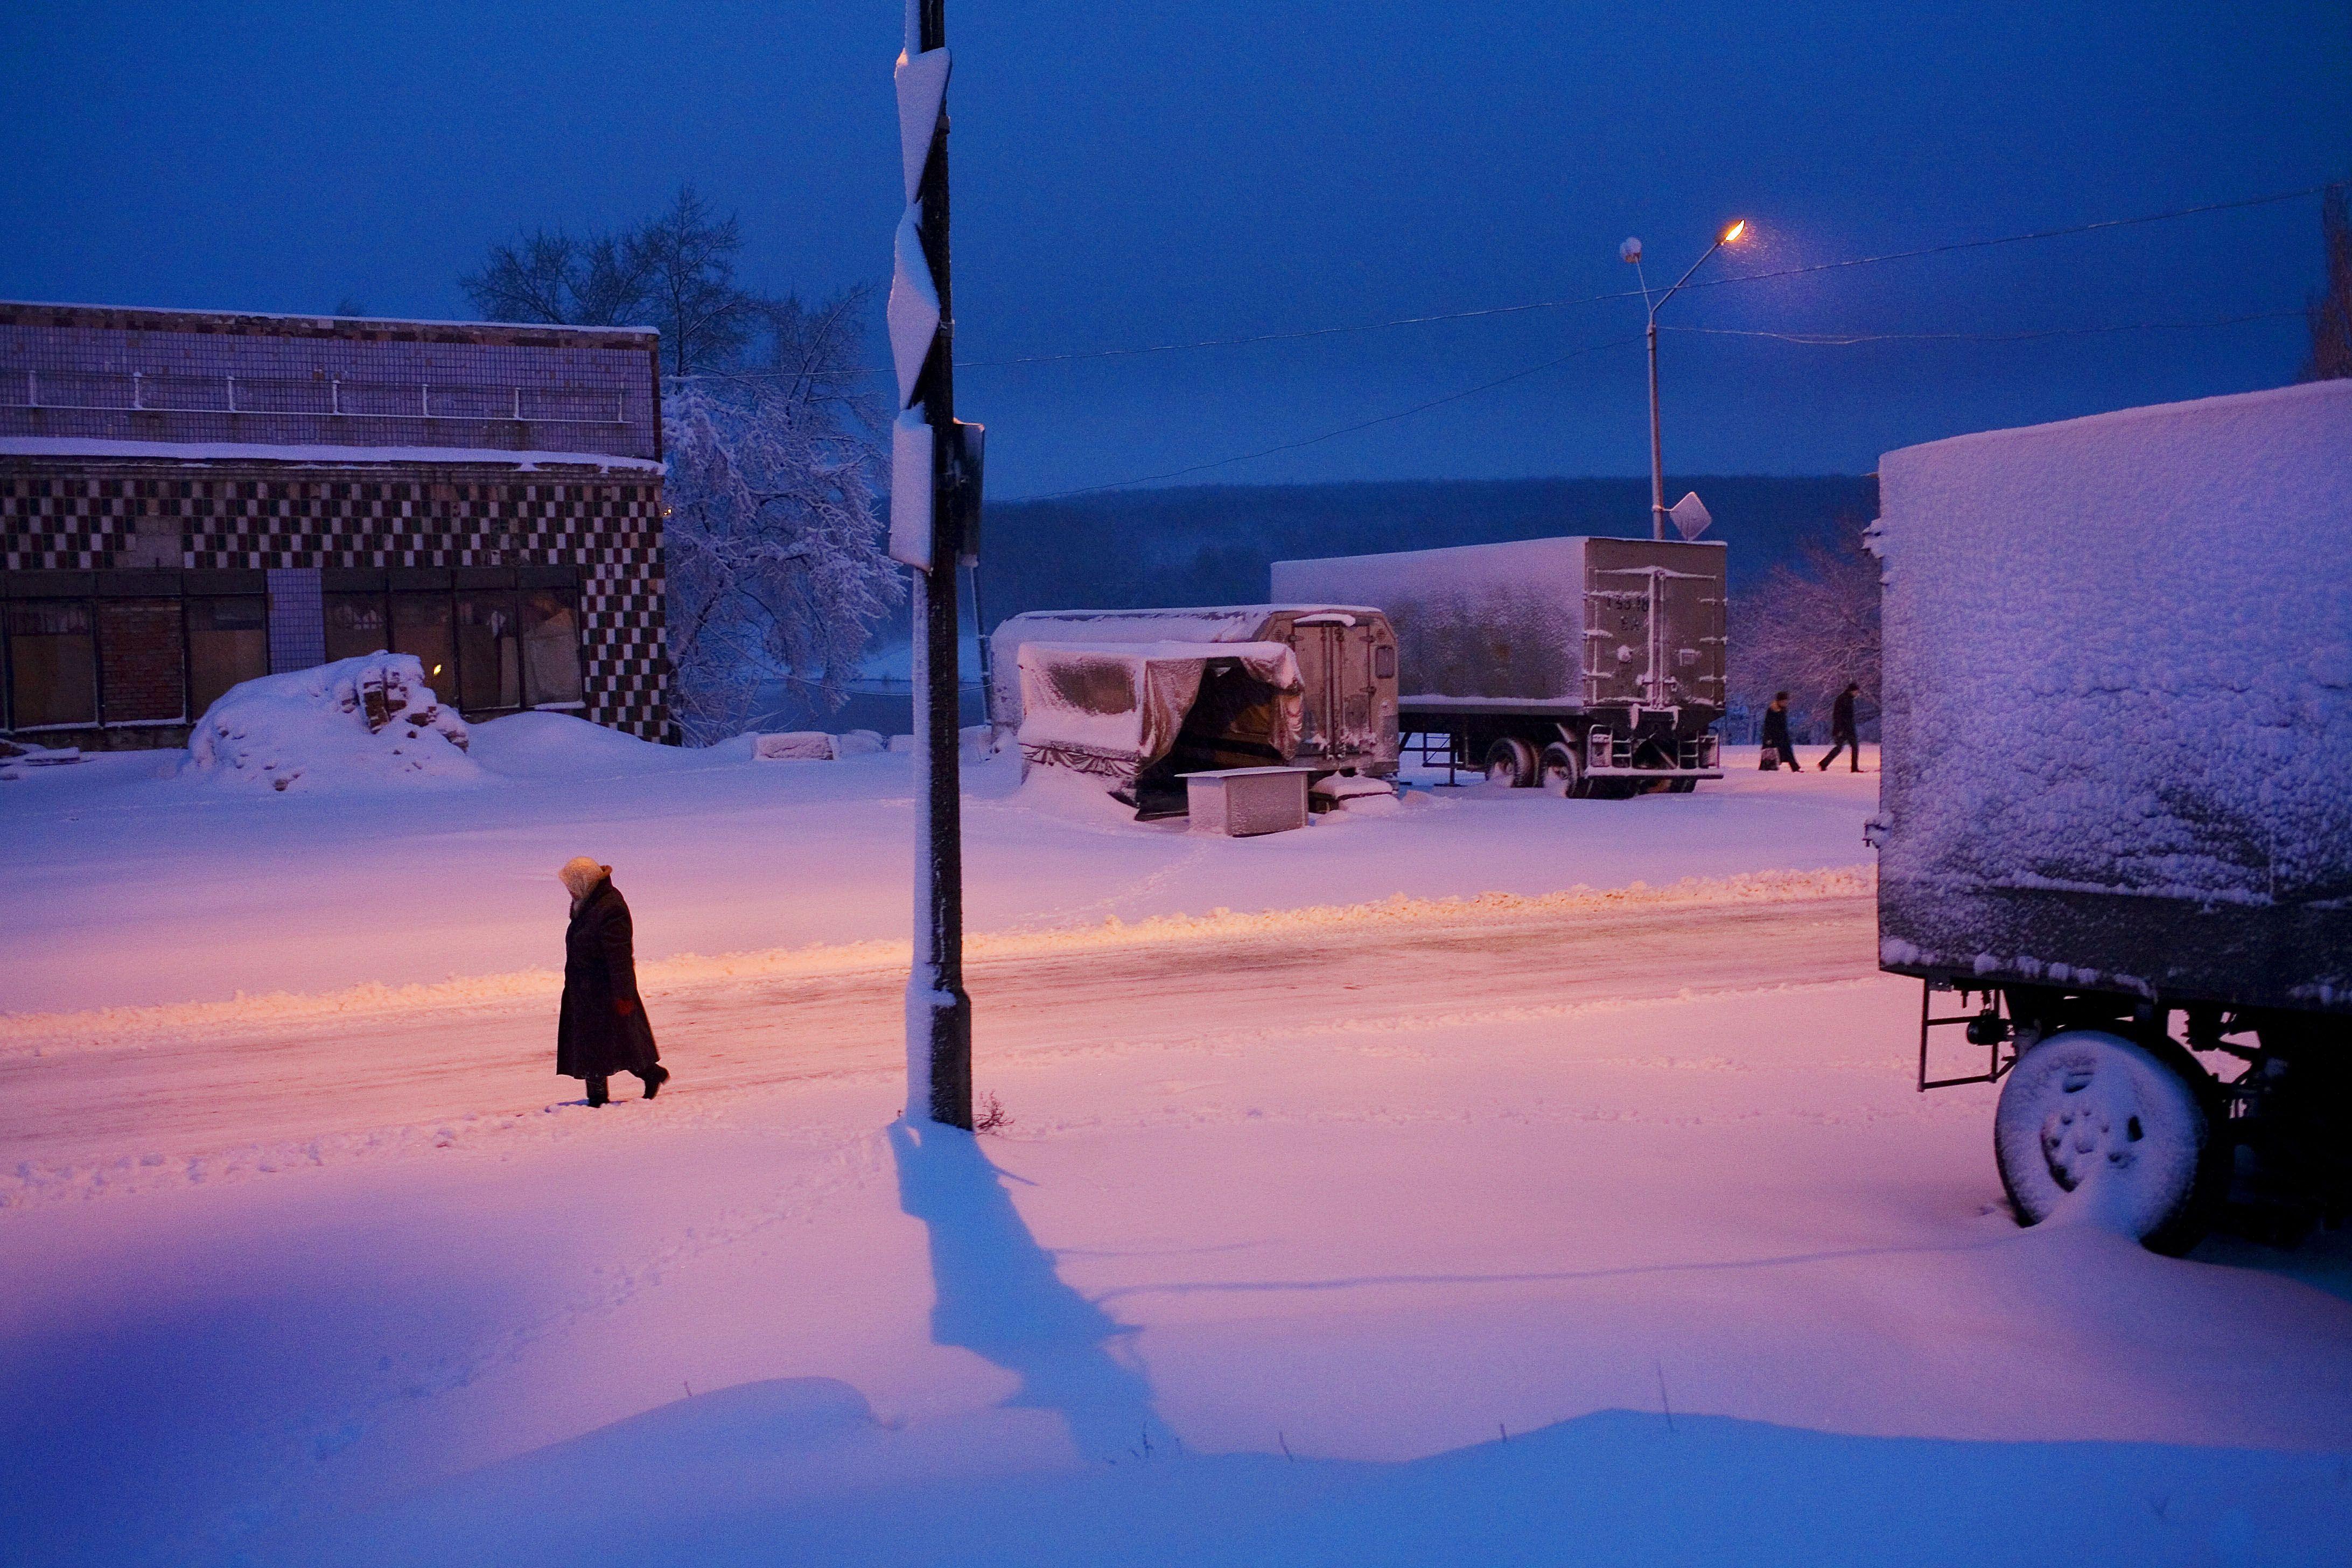 UKRAINE. Torez, Donetsk Oblast. 2007. A woman walks in the snow at dawn in winter. (© Carolyn Drake/Magnum Photos)